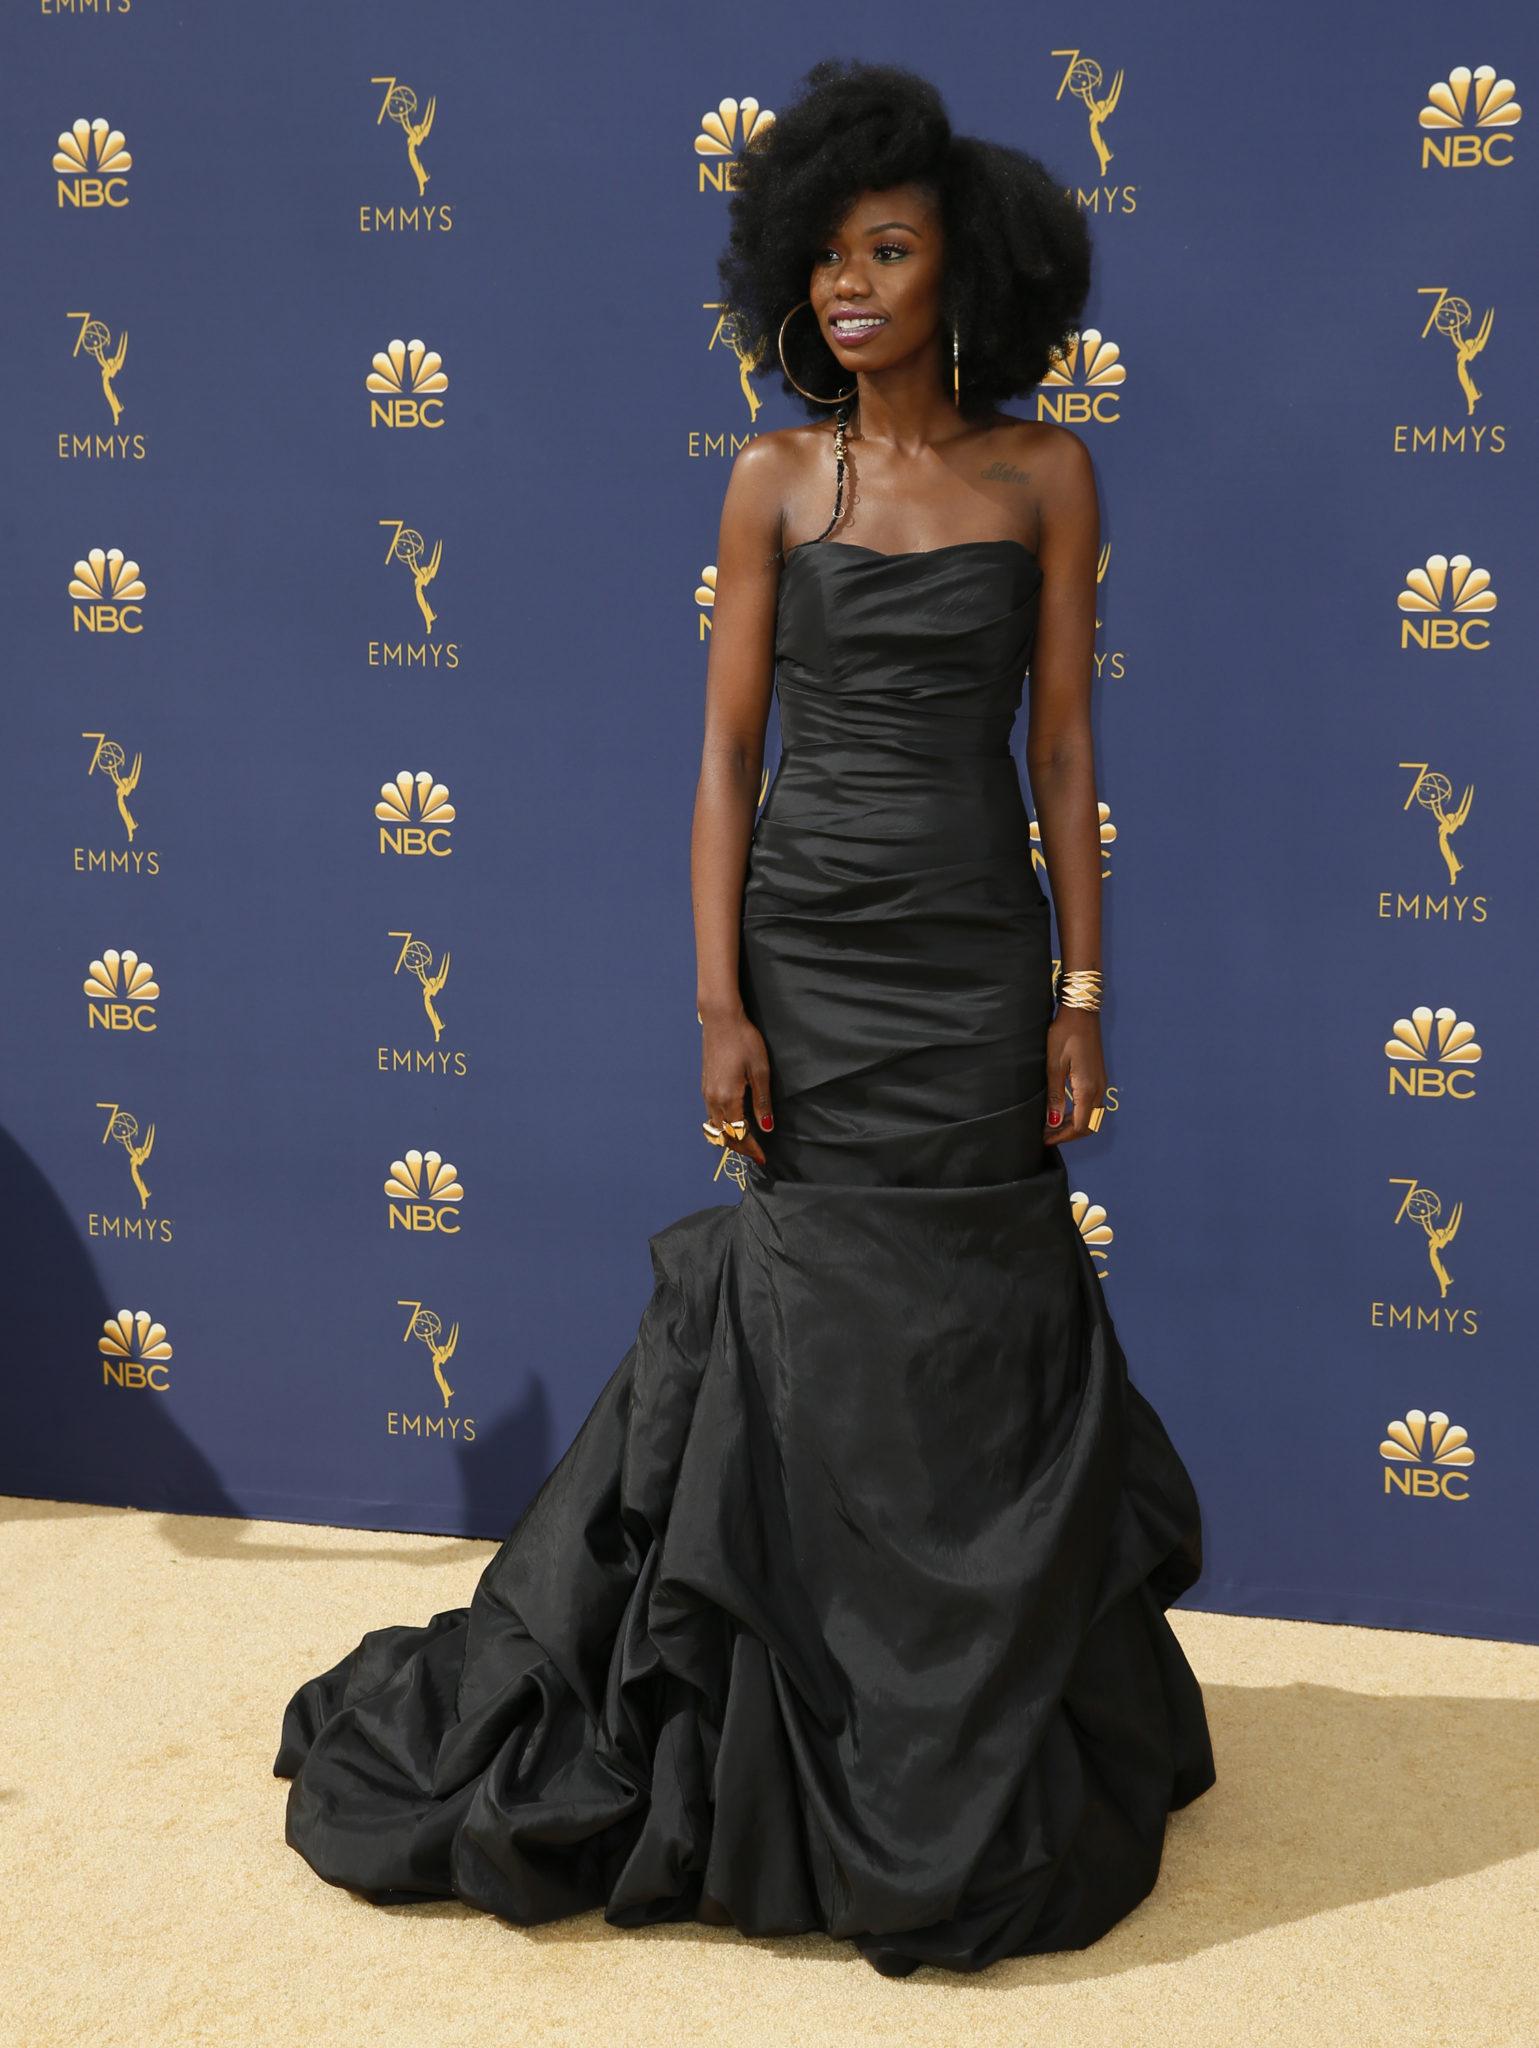 Xosha Roquemore Emmys 4Chion Lifestyle